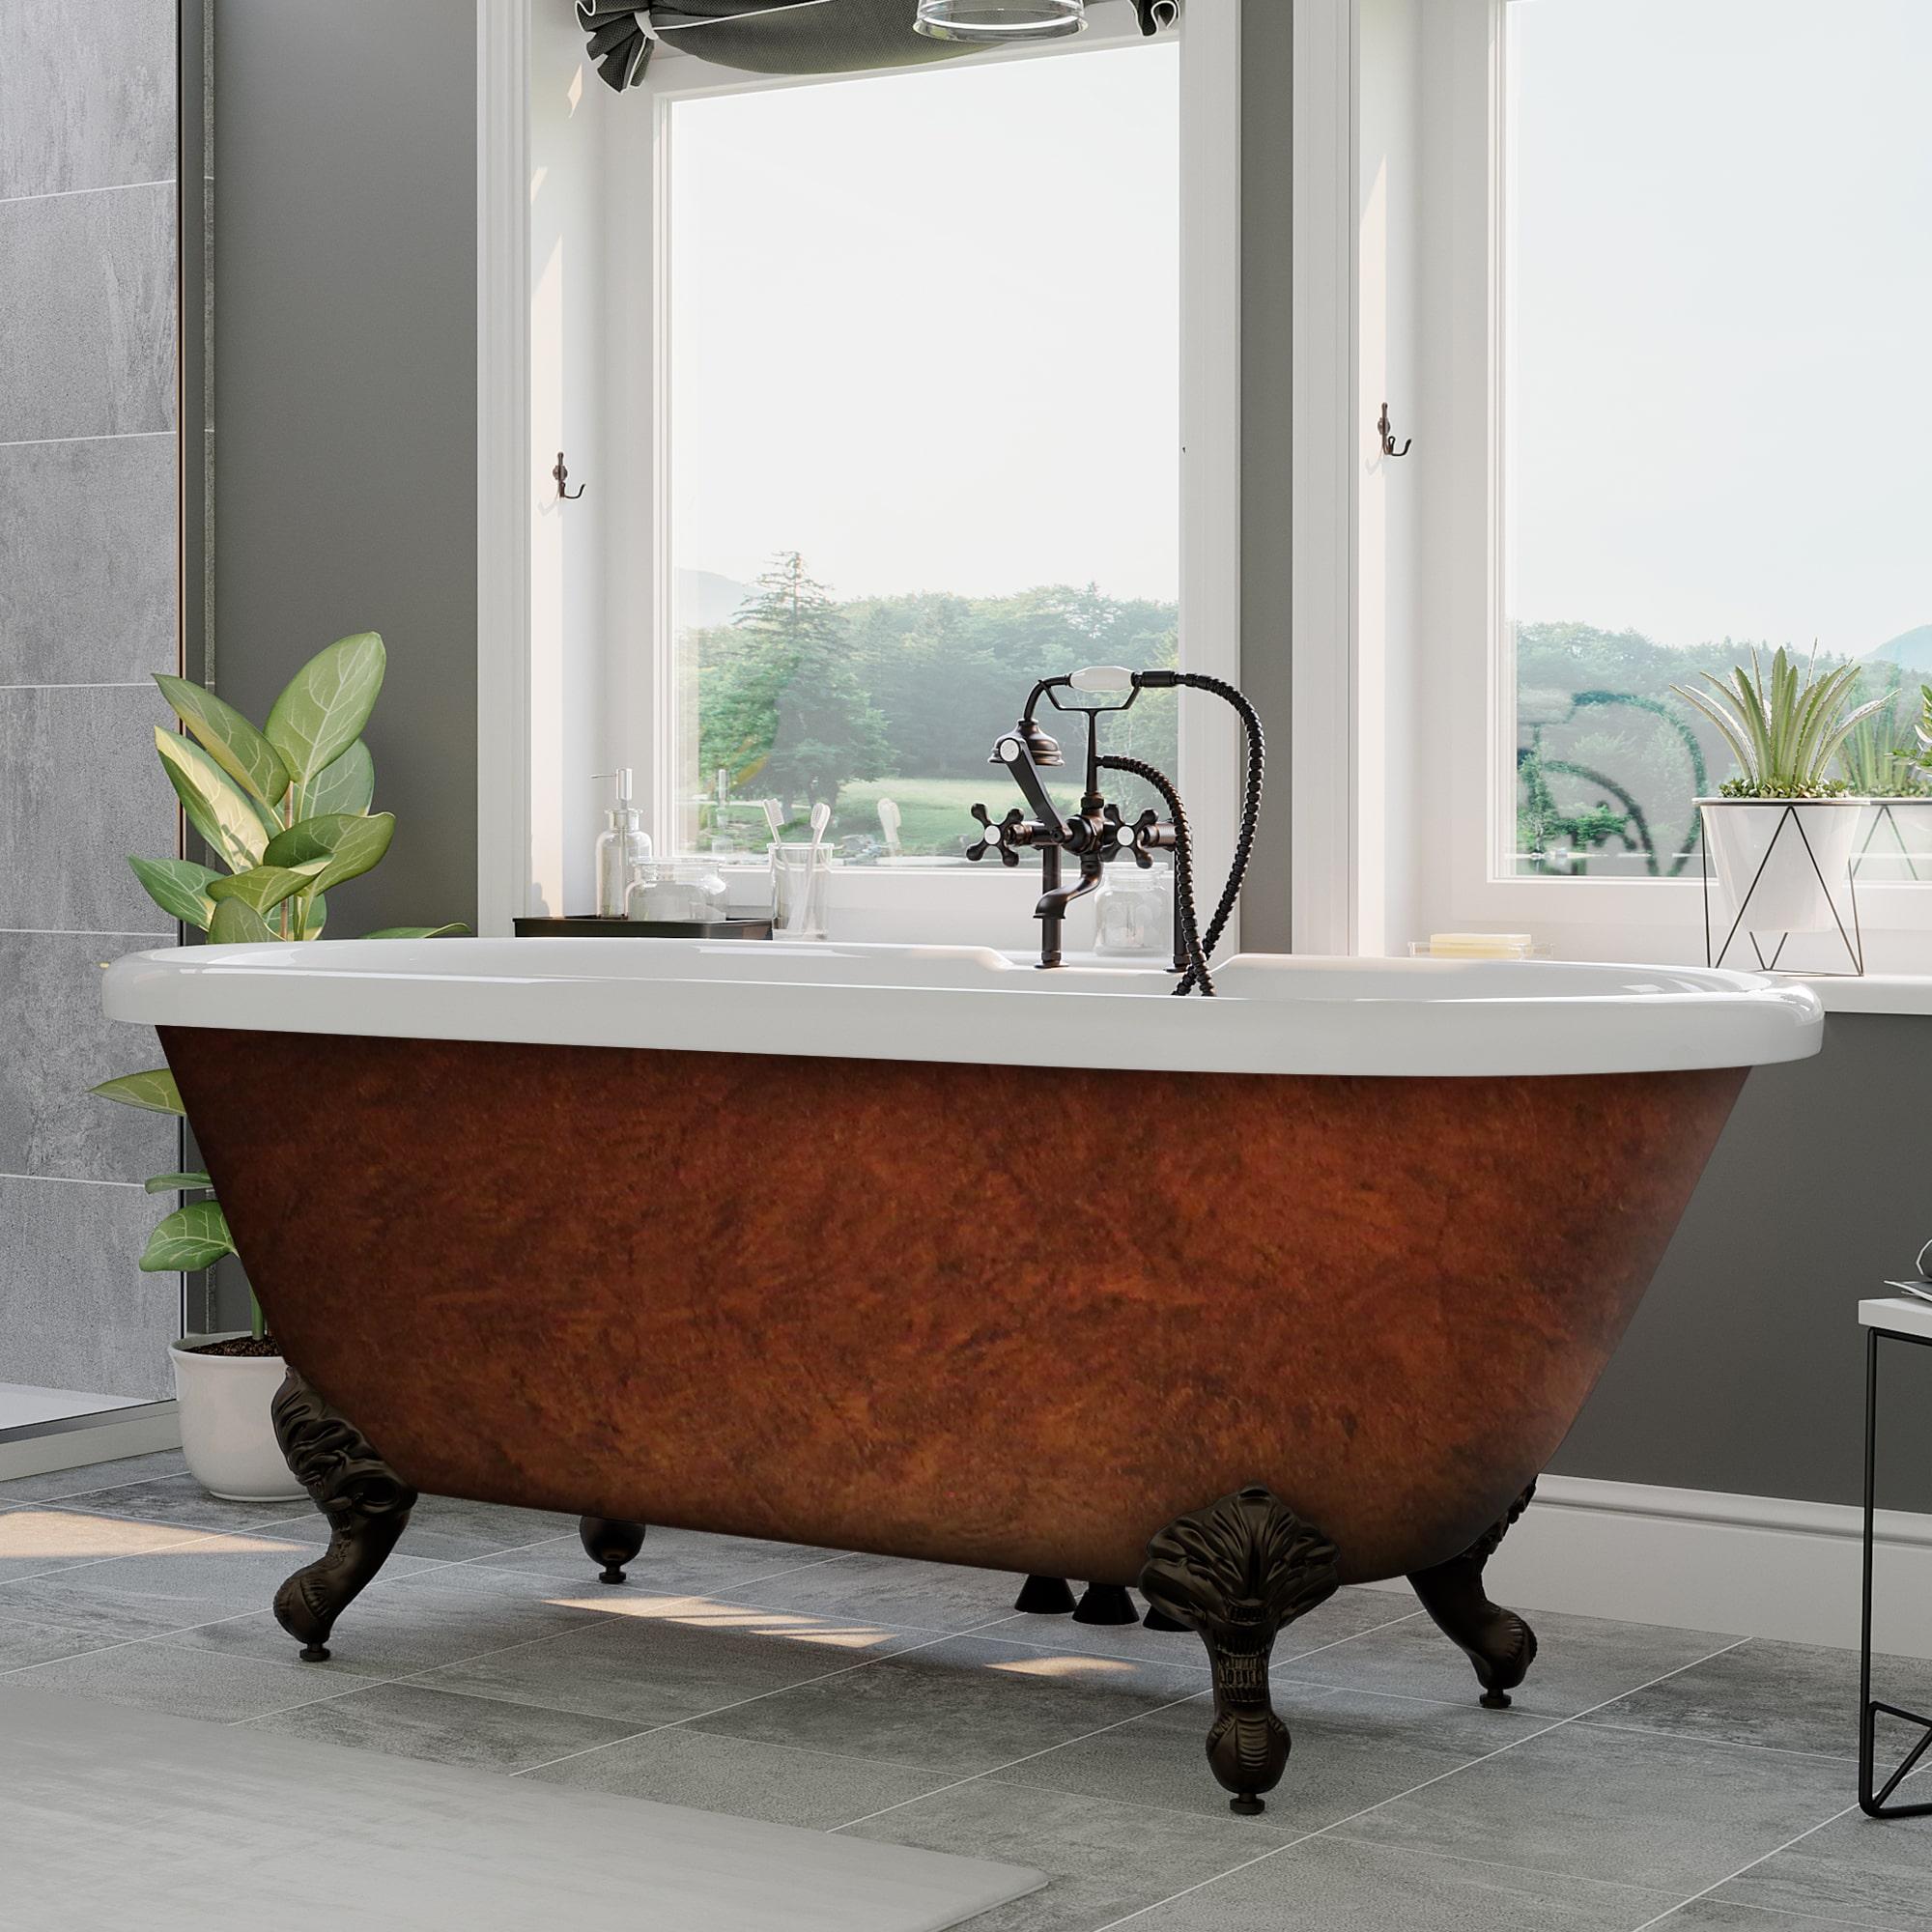 clawfoot tub, copper bronze tub,